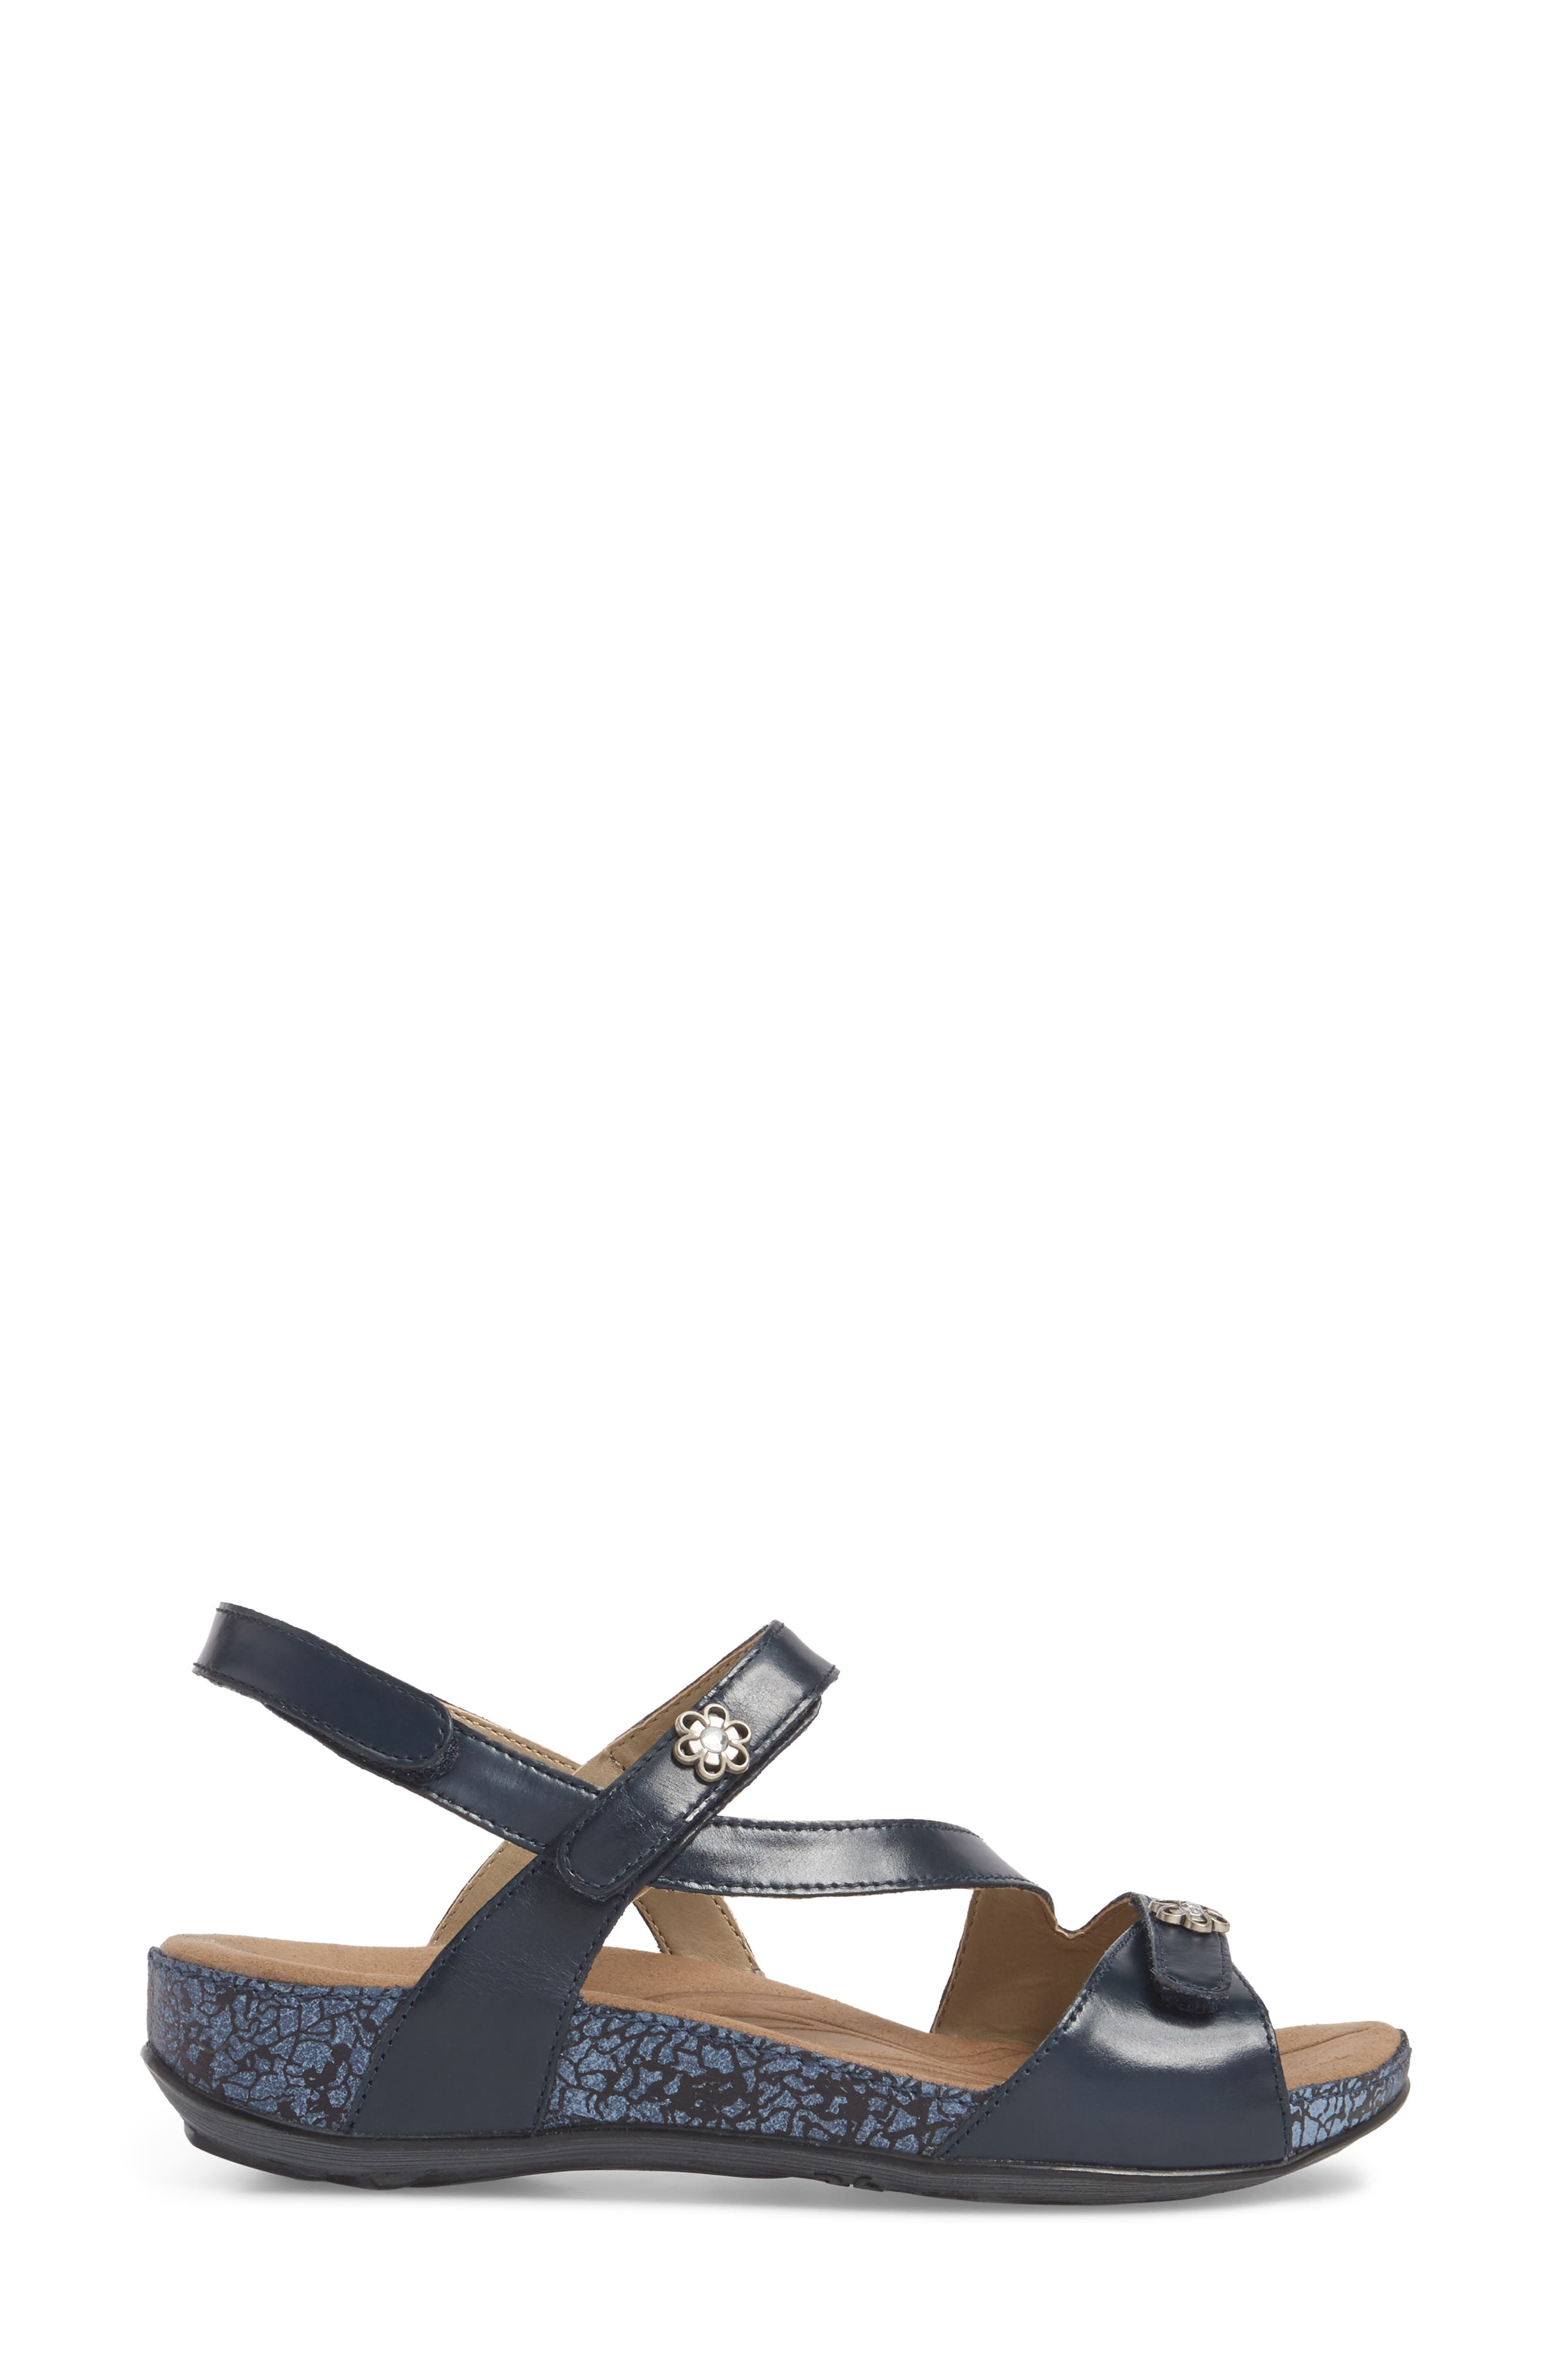 Fidschi 54 Sandal,                             Alternate thumbnail 3, color,                             JEANS LEATHER